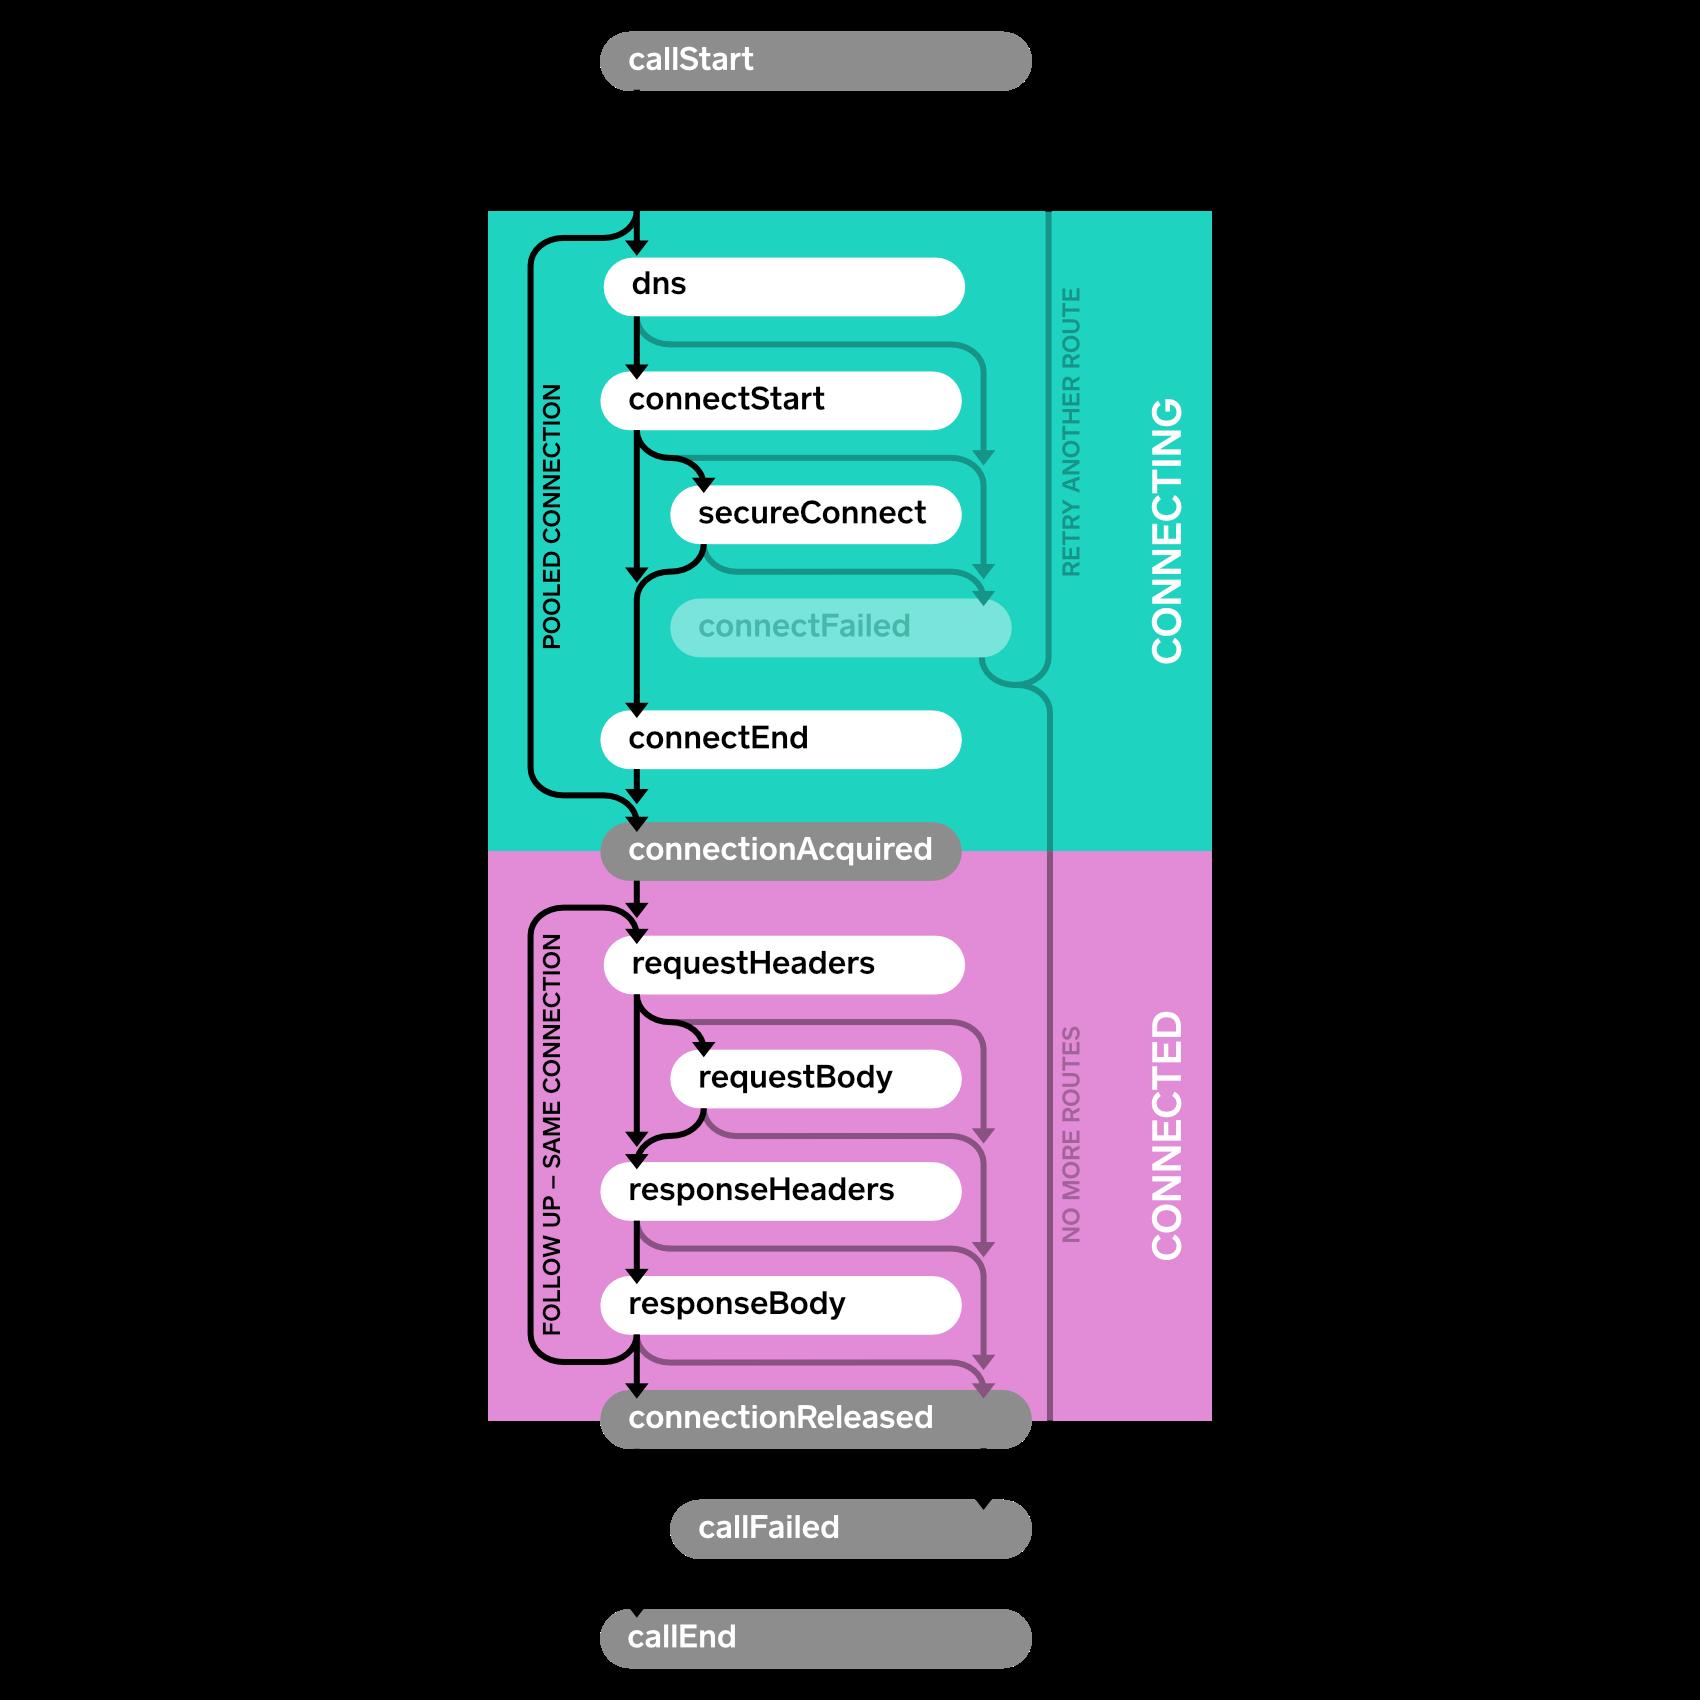 Events Diagram